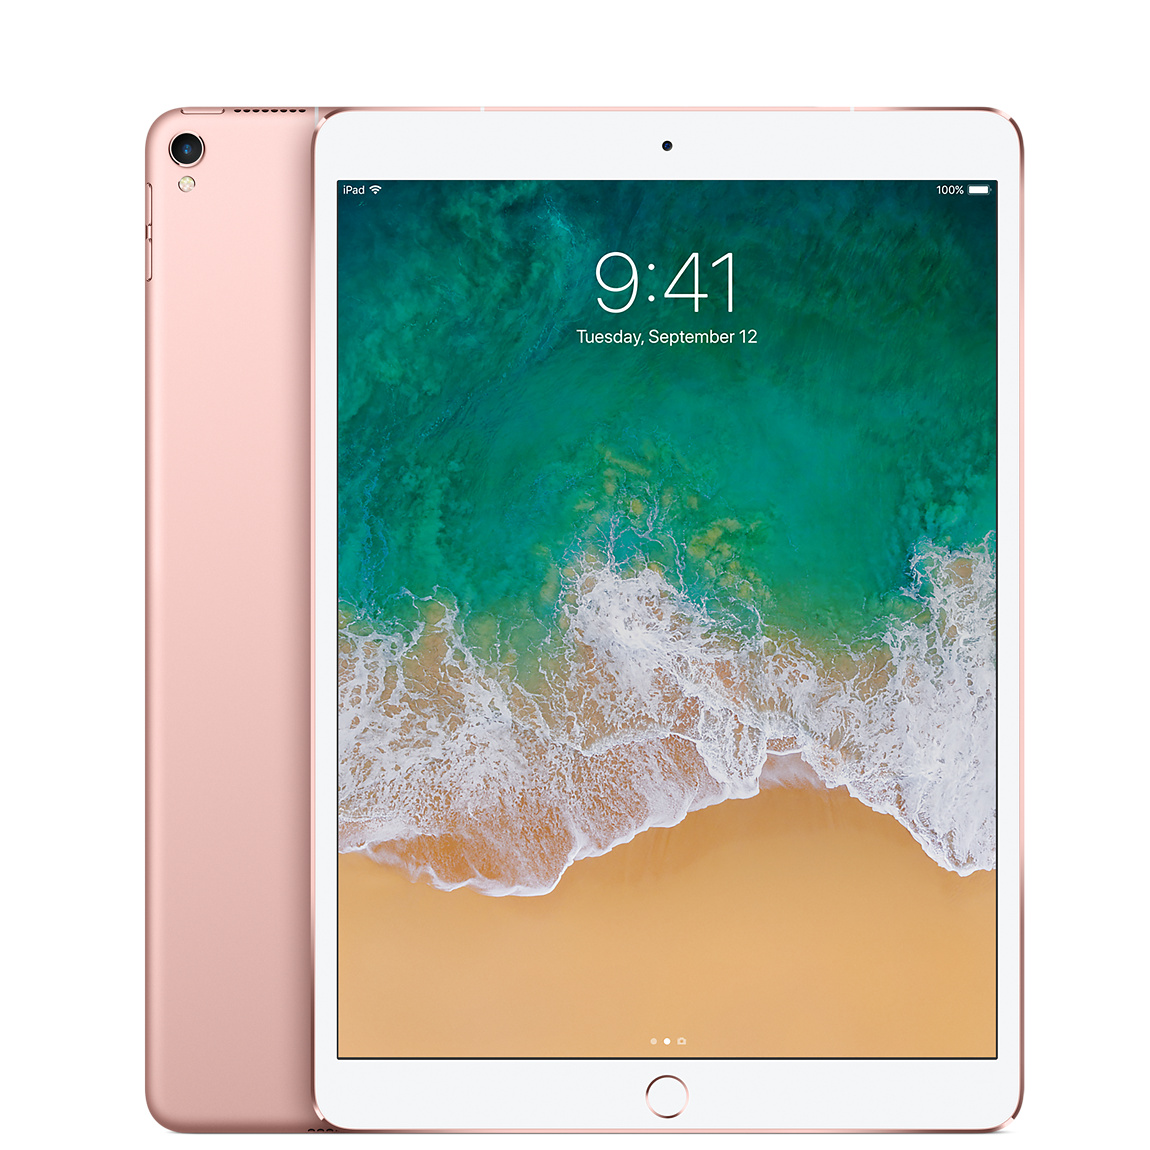 Refurbished 10 5 Inch Ipad Pro Wi Fi Cellular 256gb Rose Gold Apple